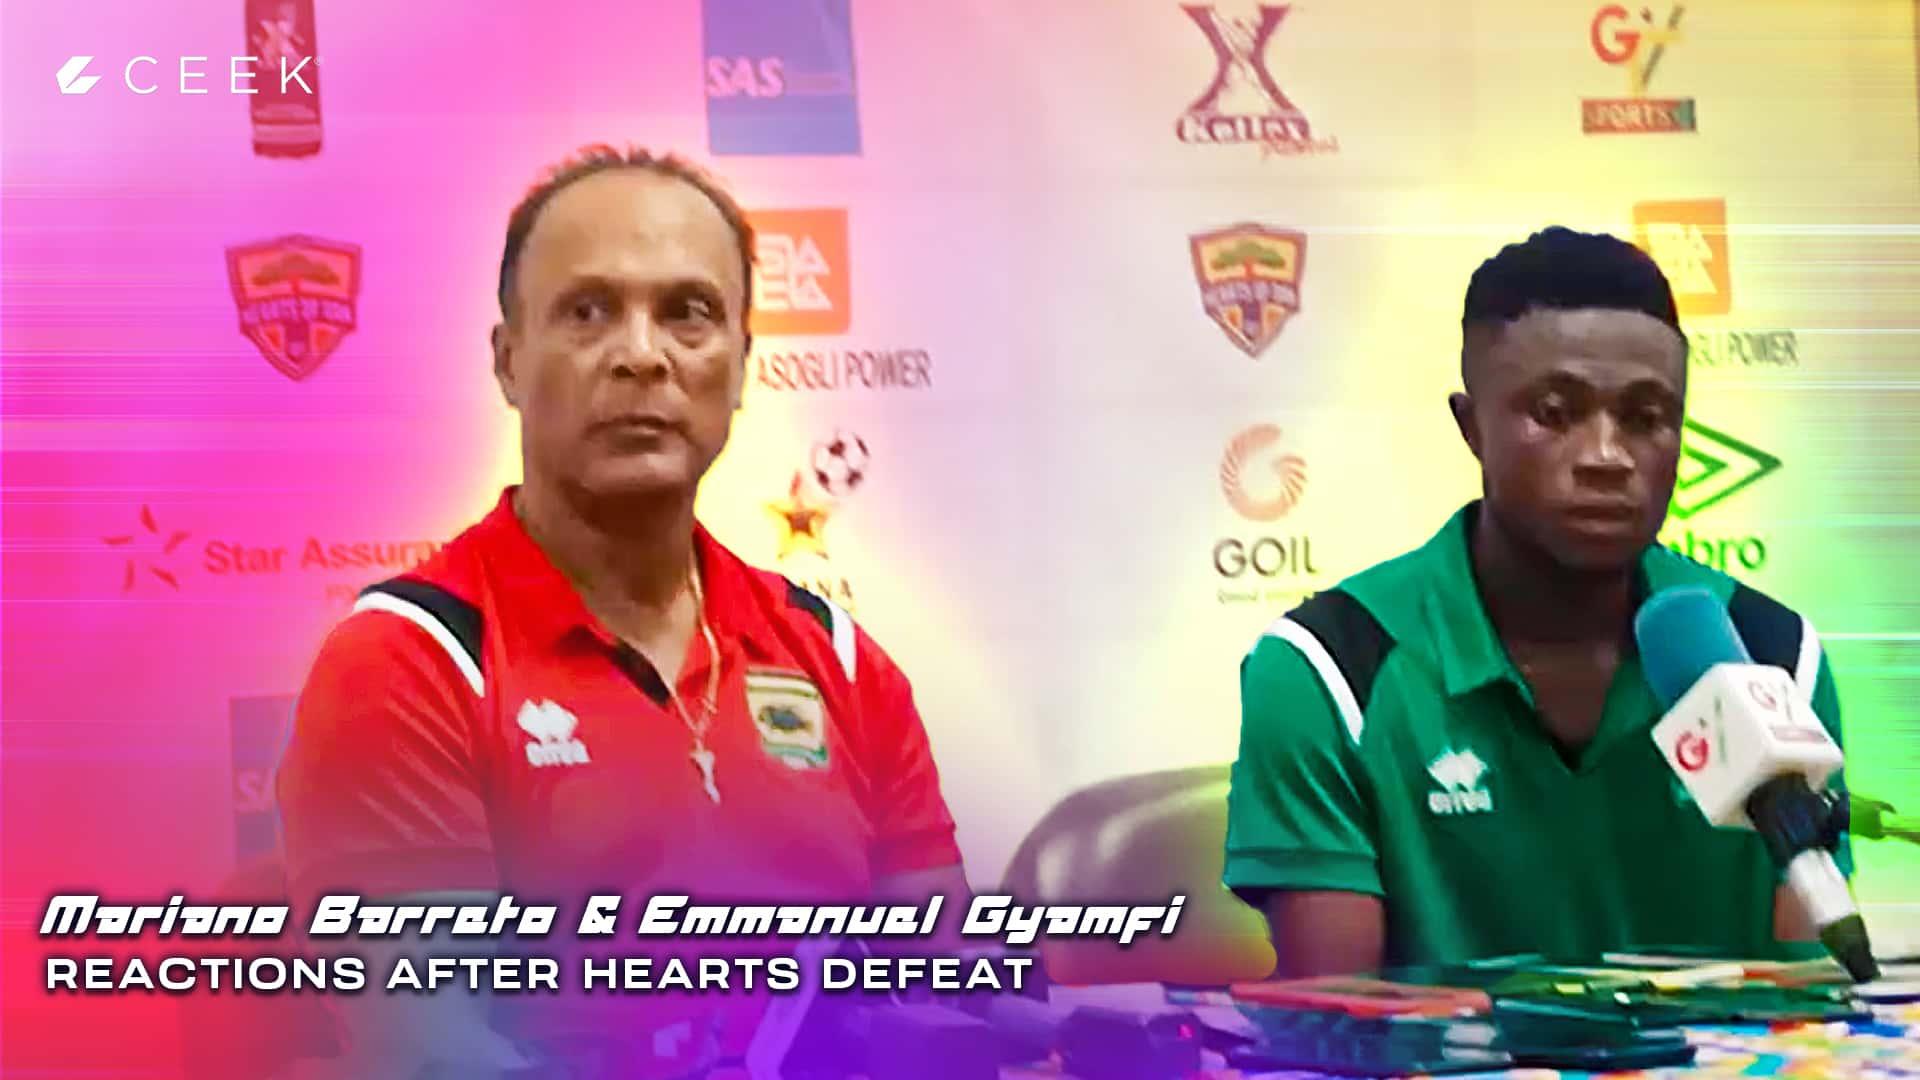 Mariano Barreto and Emmanuel Gyamfi reactions after Hearts defeat